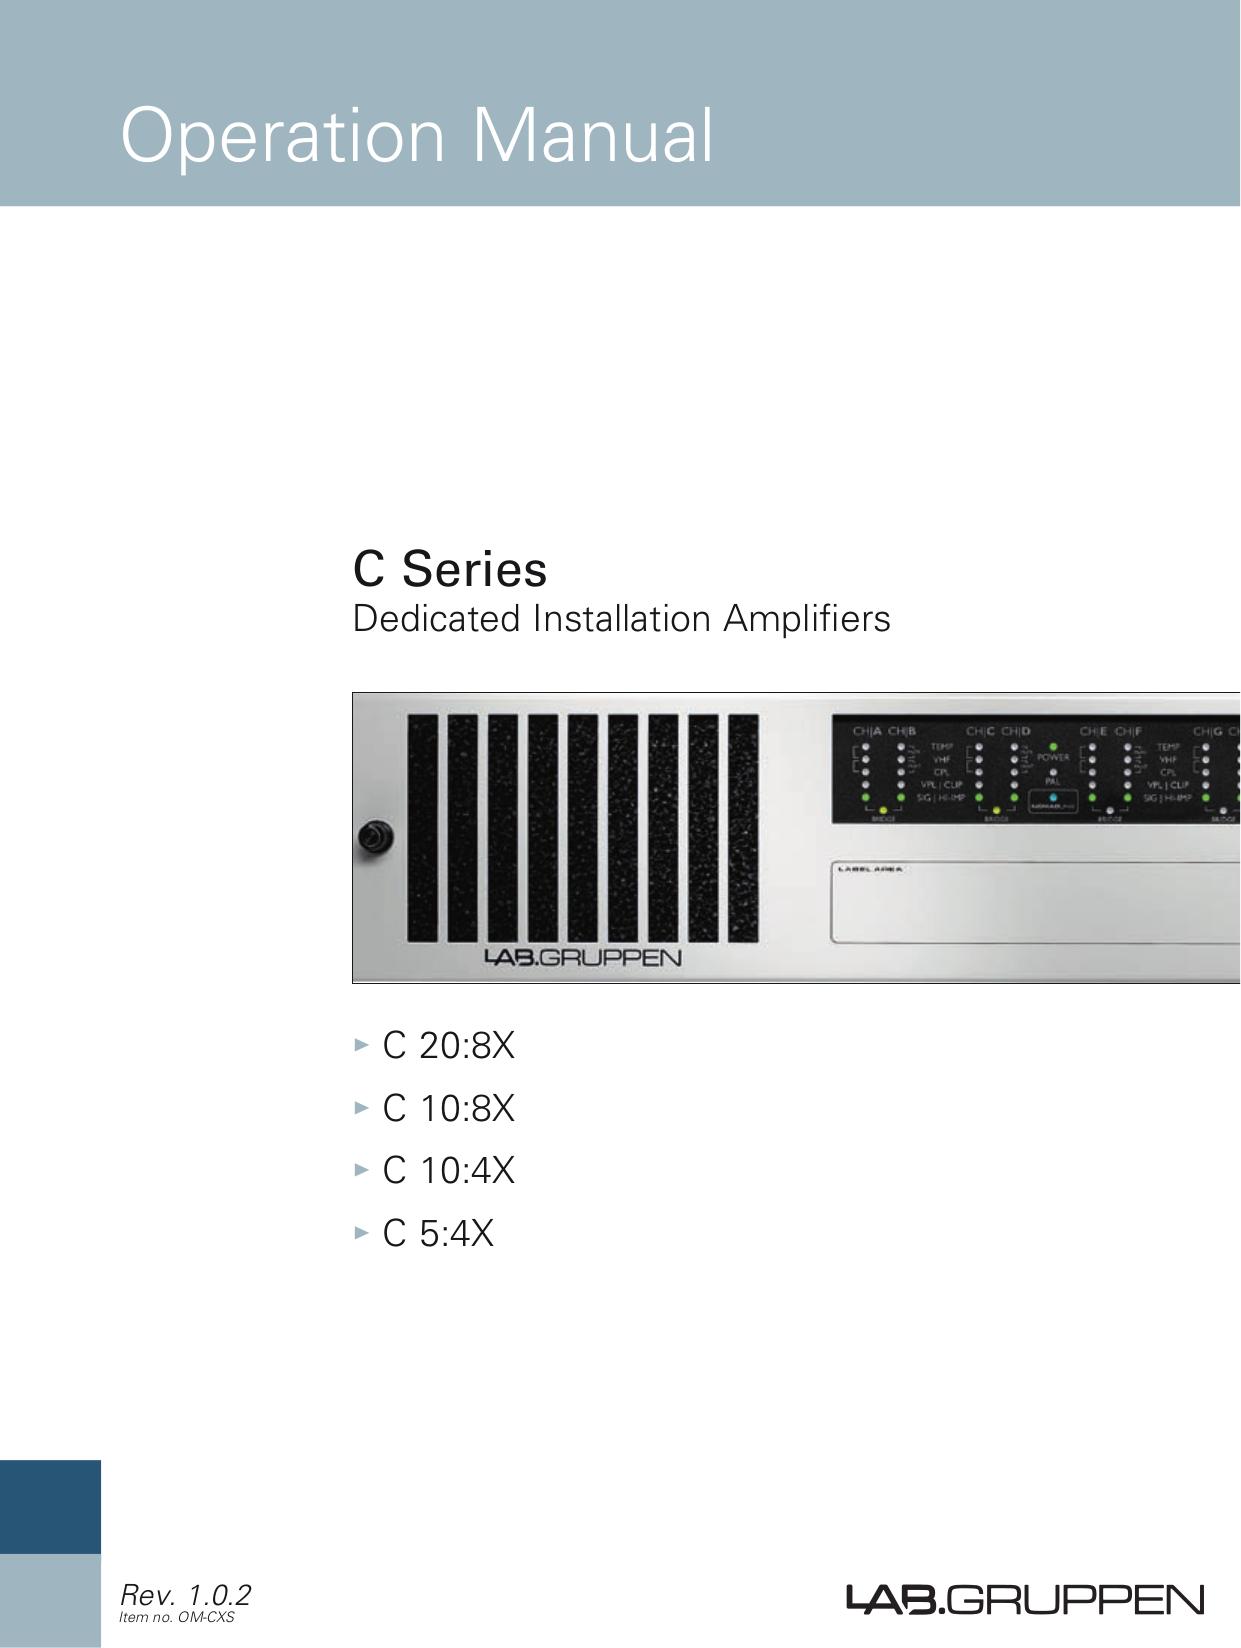 pdf for Lab.gruppen Amp C Series C 20 8X manual